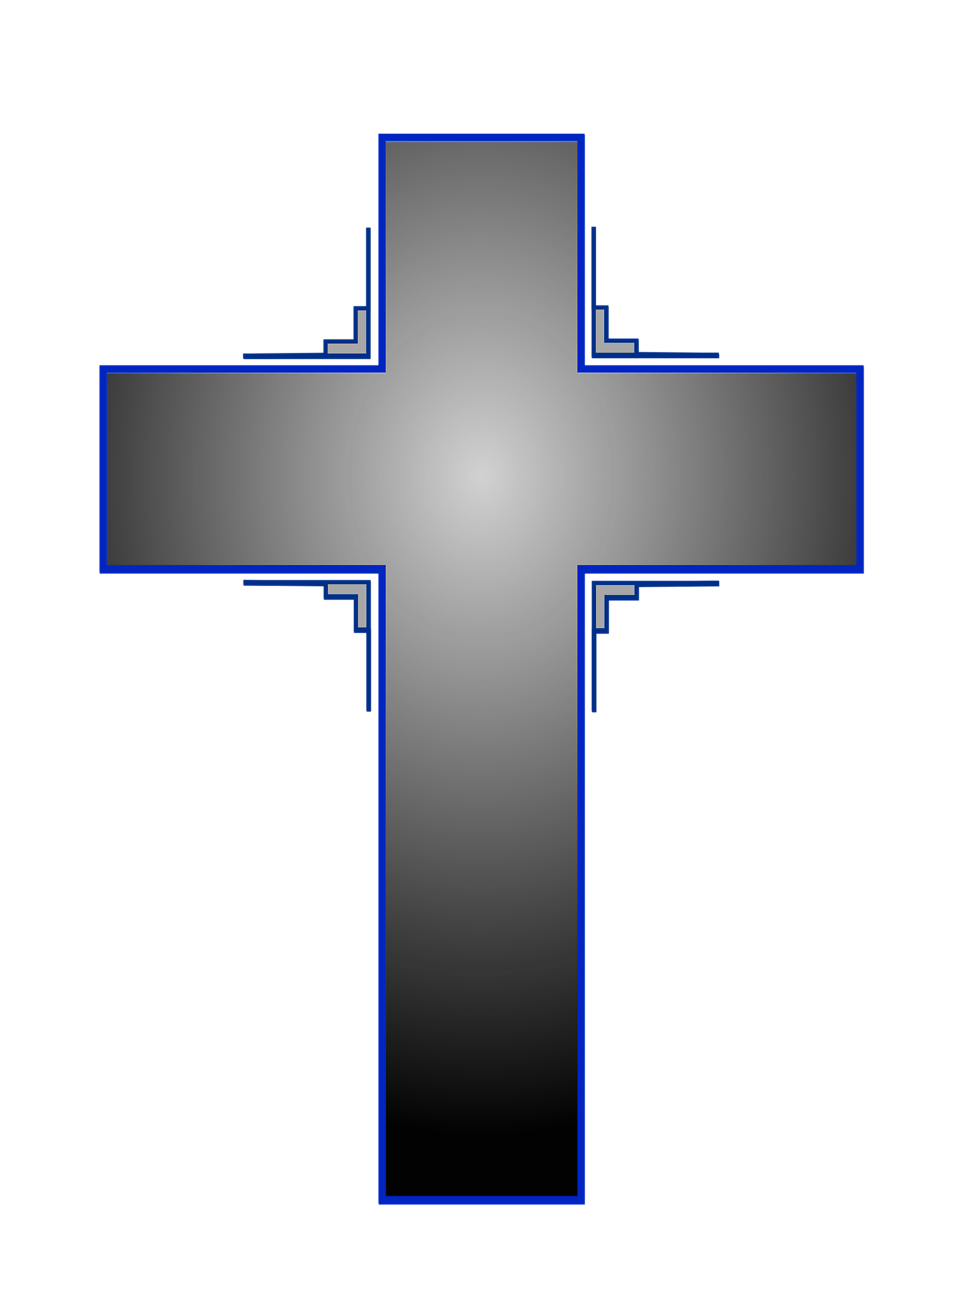 Cross | Free Stock Photo | Illustration of a cross | # 15021